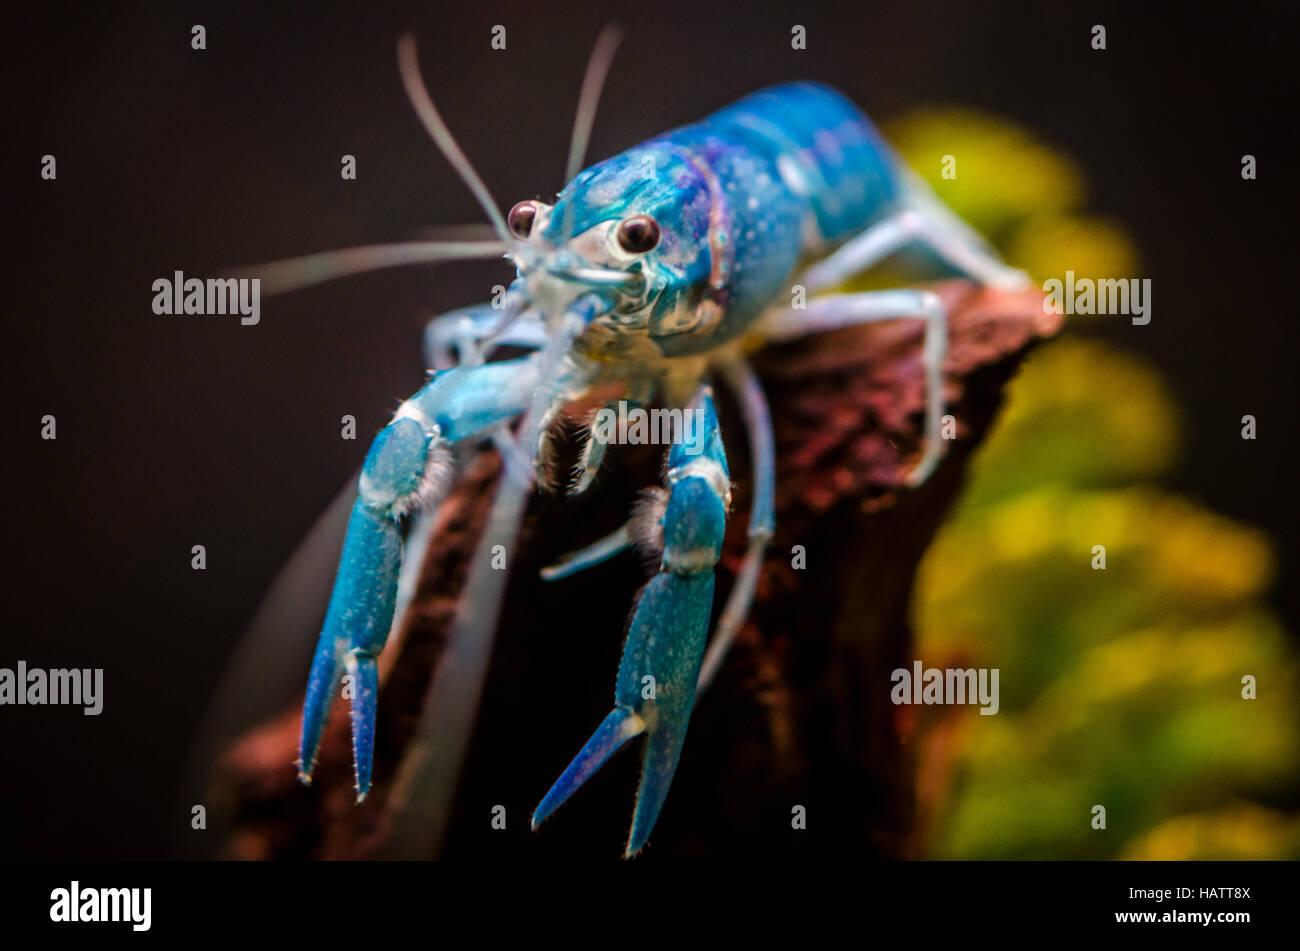 Crayfish Marine Tank Aquarium Imágenes De Stock & Crayfish Marine ...